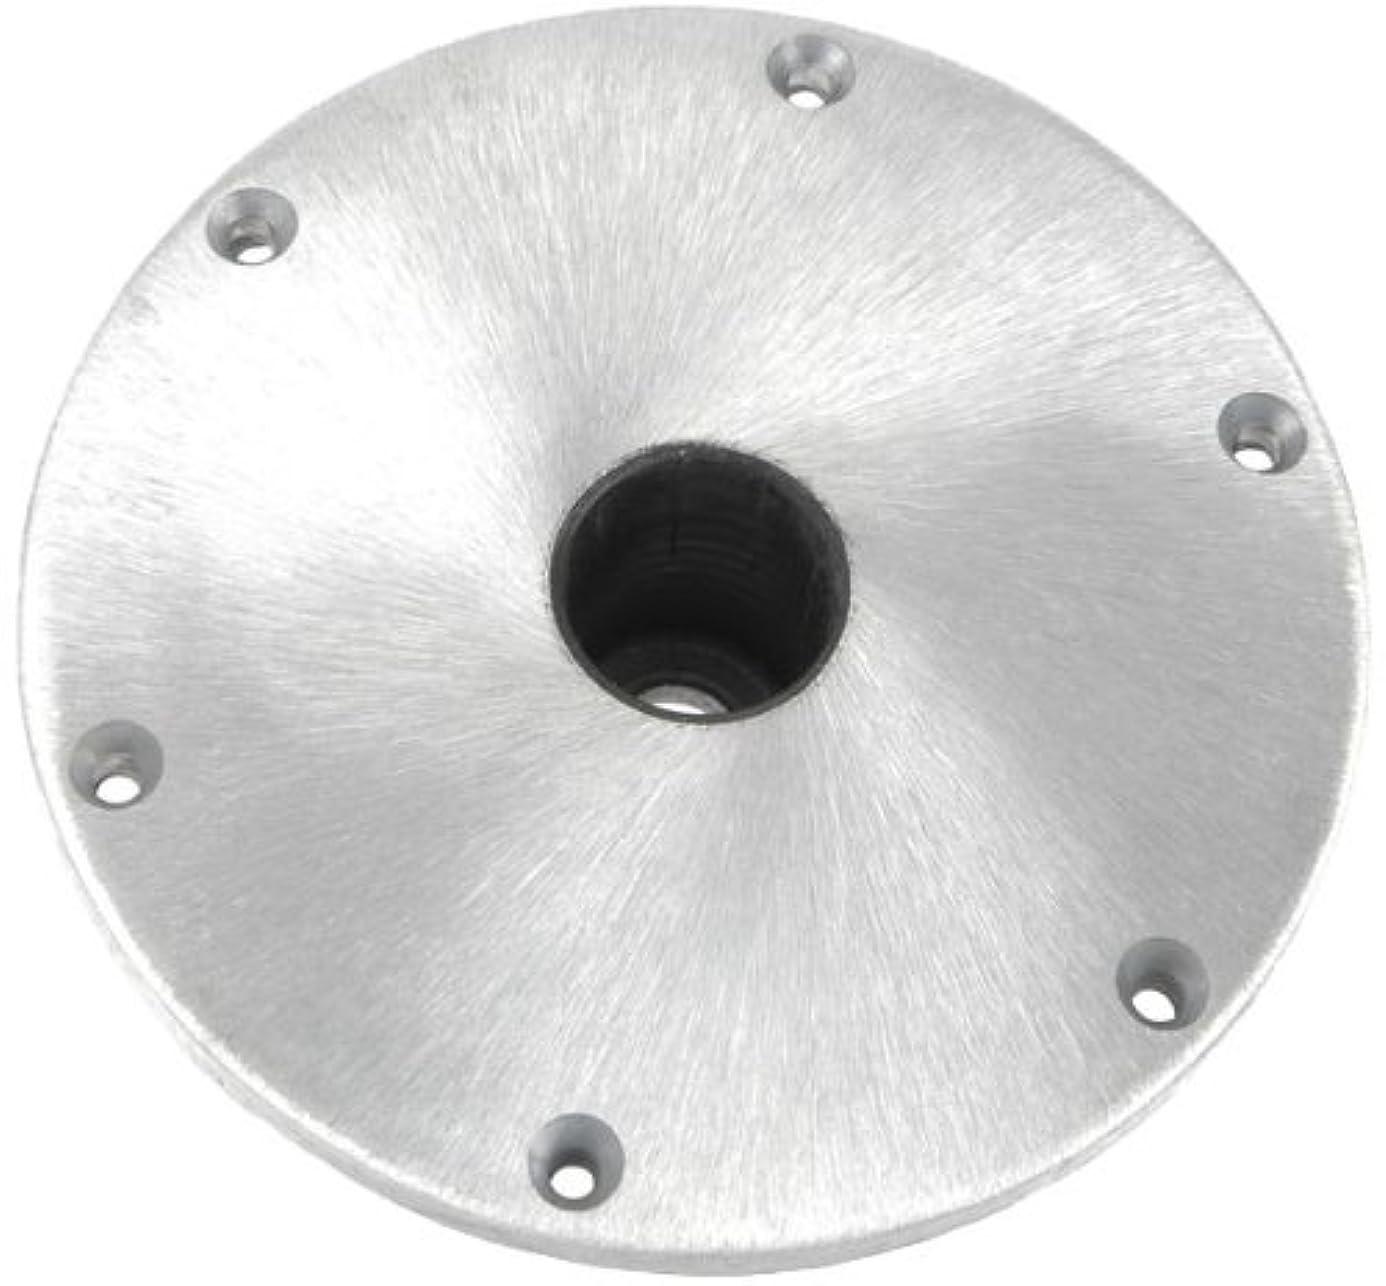 Springfield Marine 1640002 9